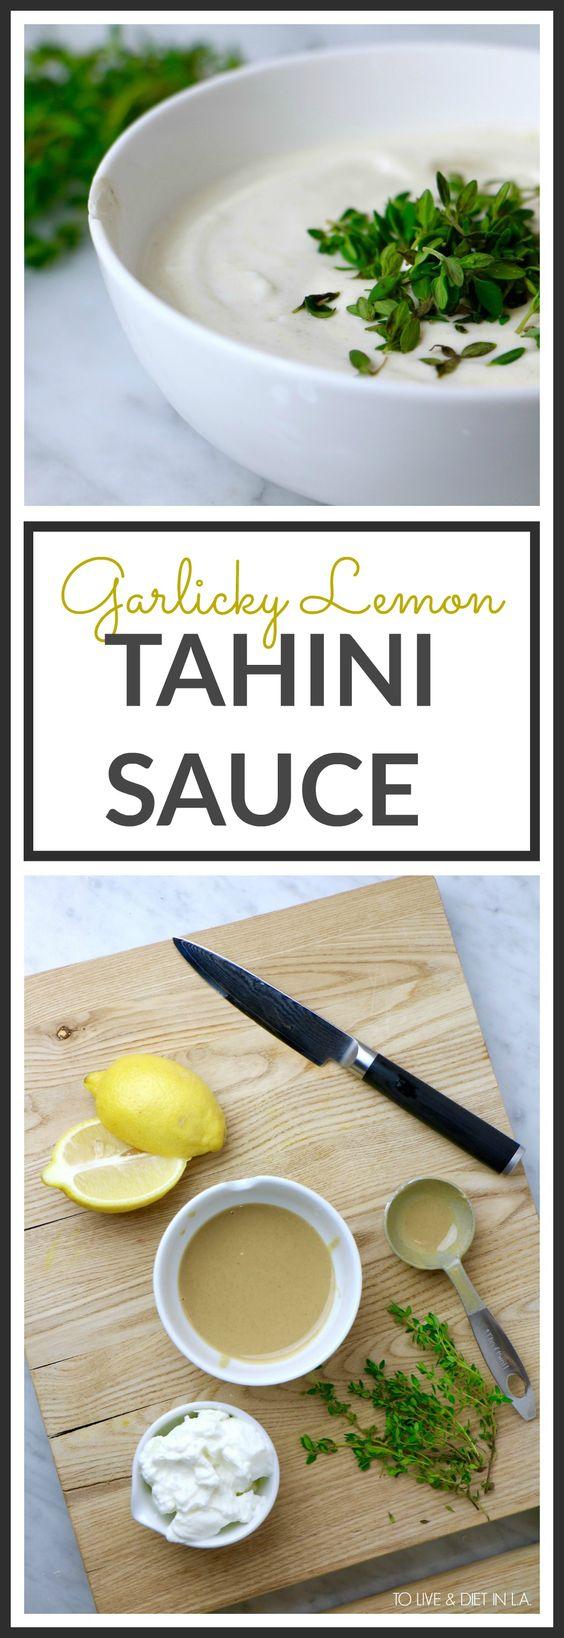 Garlicky Lemon Tahini Sauce - a rich, creamy dressing made with fresh squeezed lemon, nutty tahini, greek yogurt, minced garlic, and fresh lemon thyme.